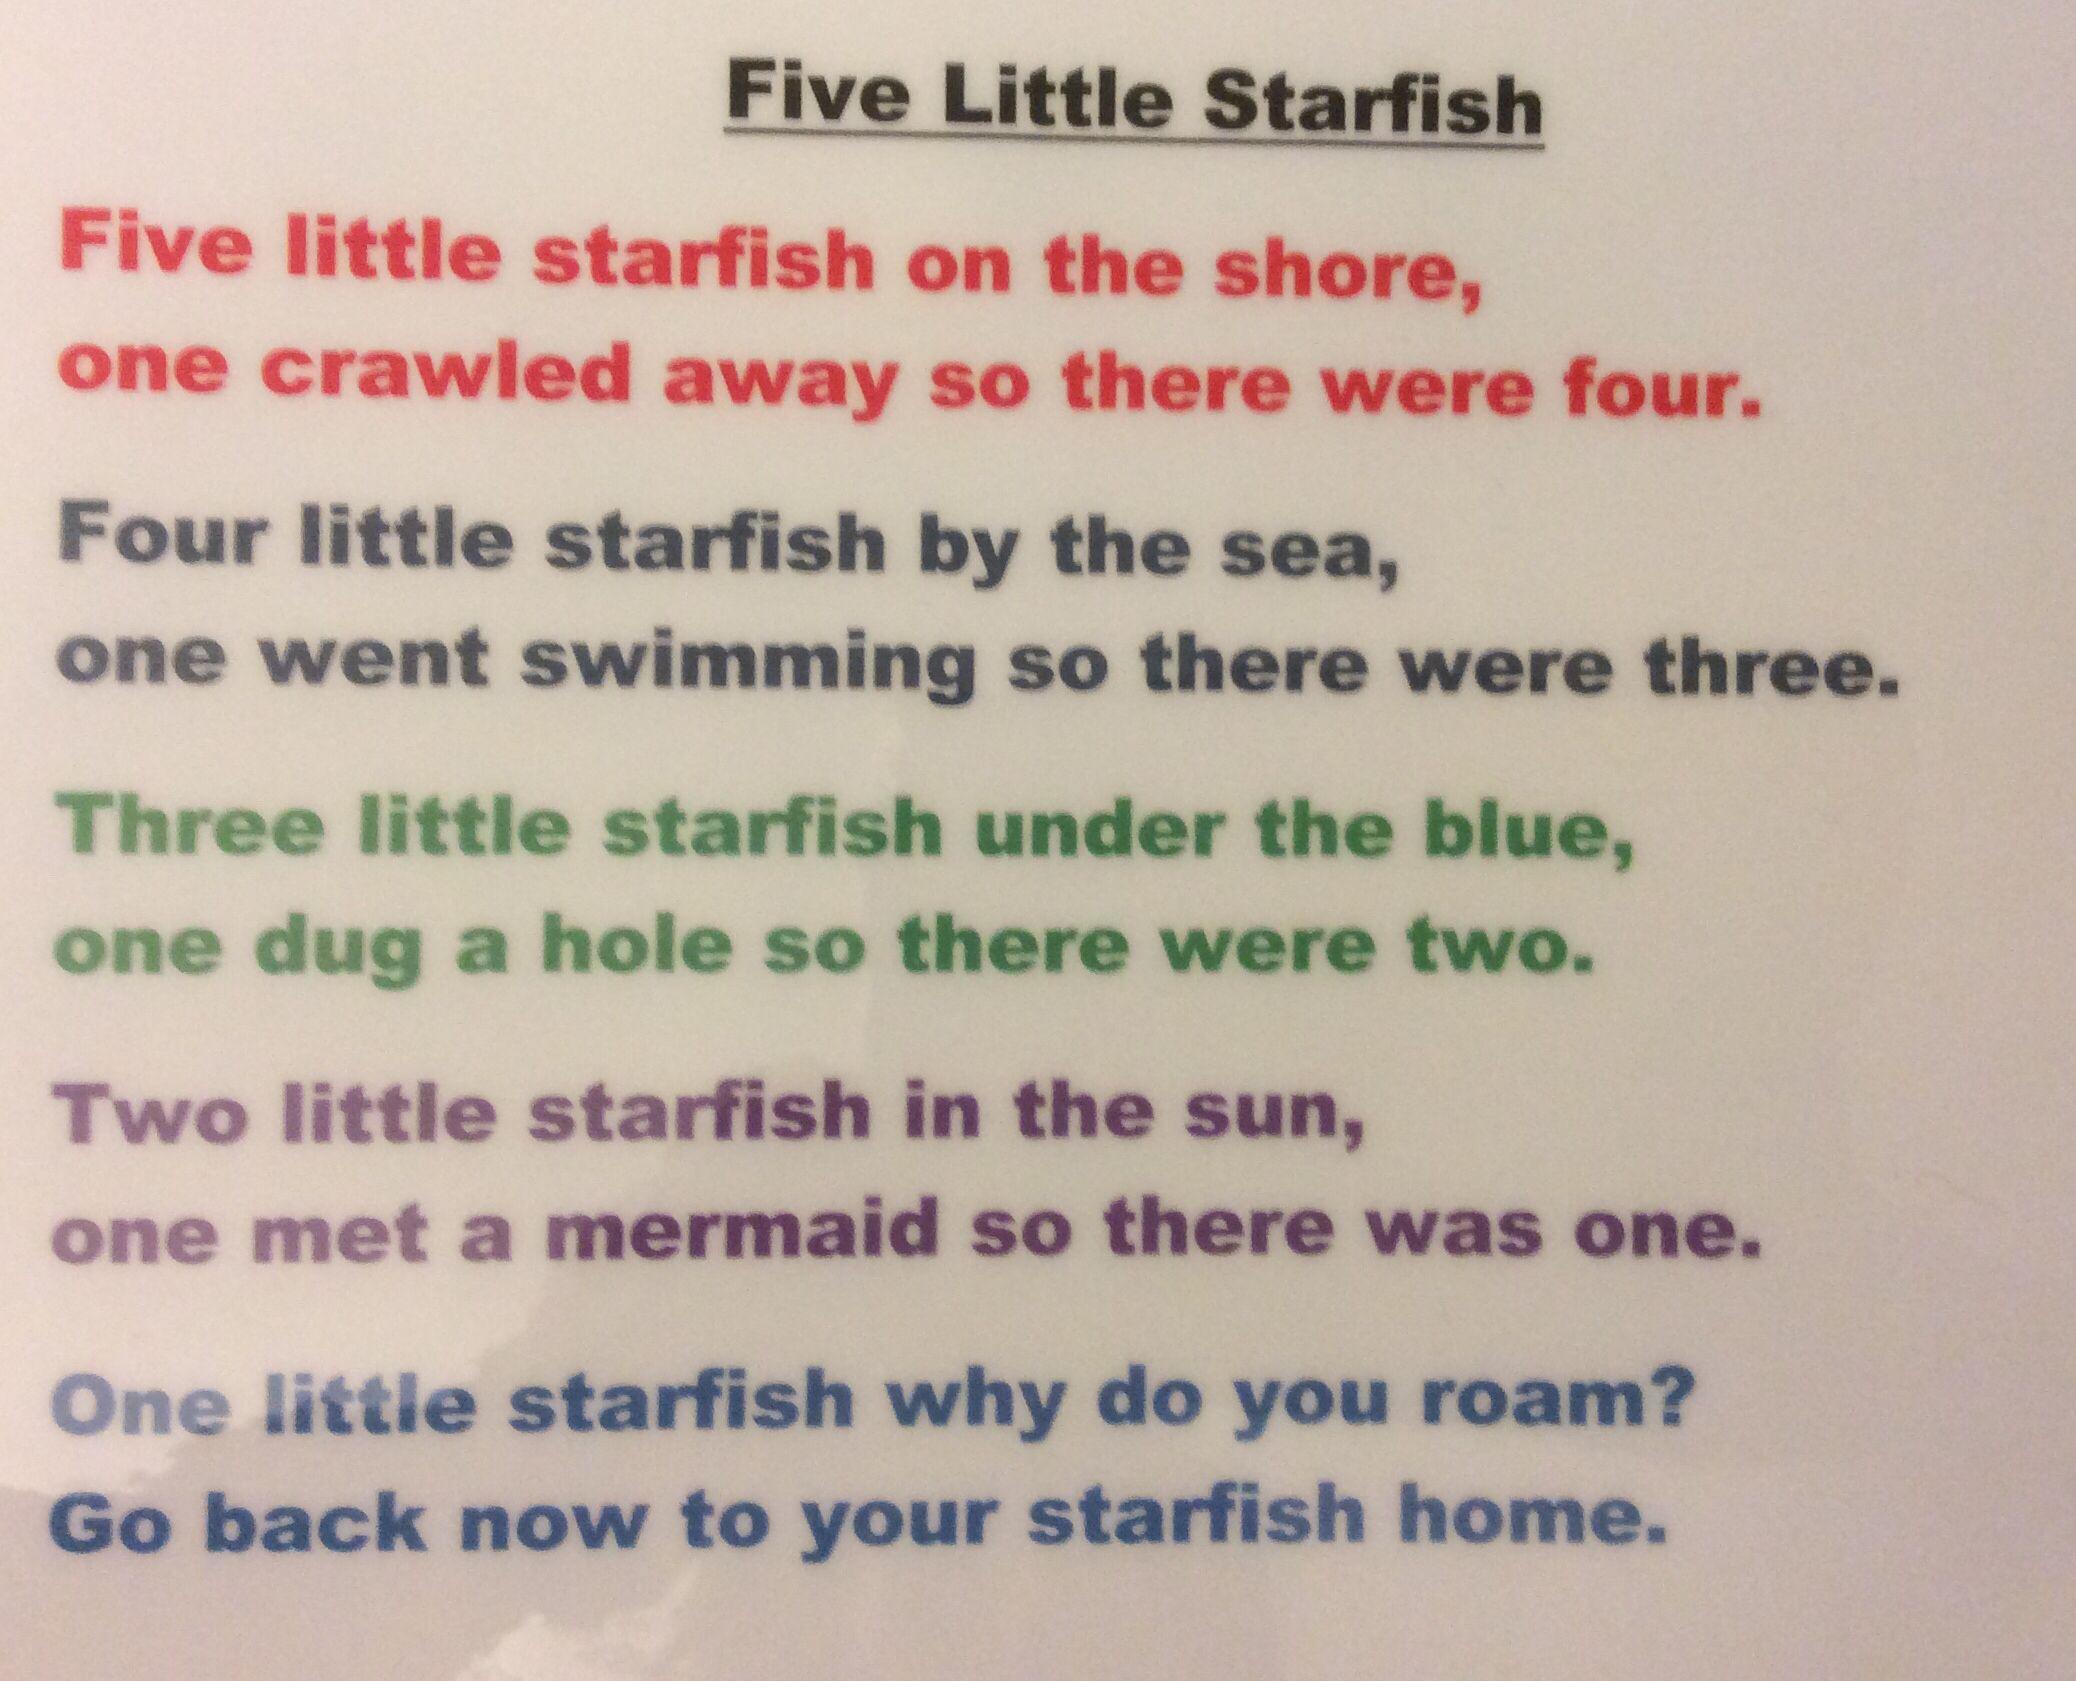 Five Little Starfish